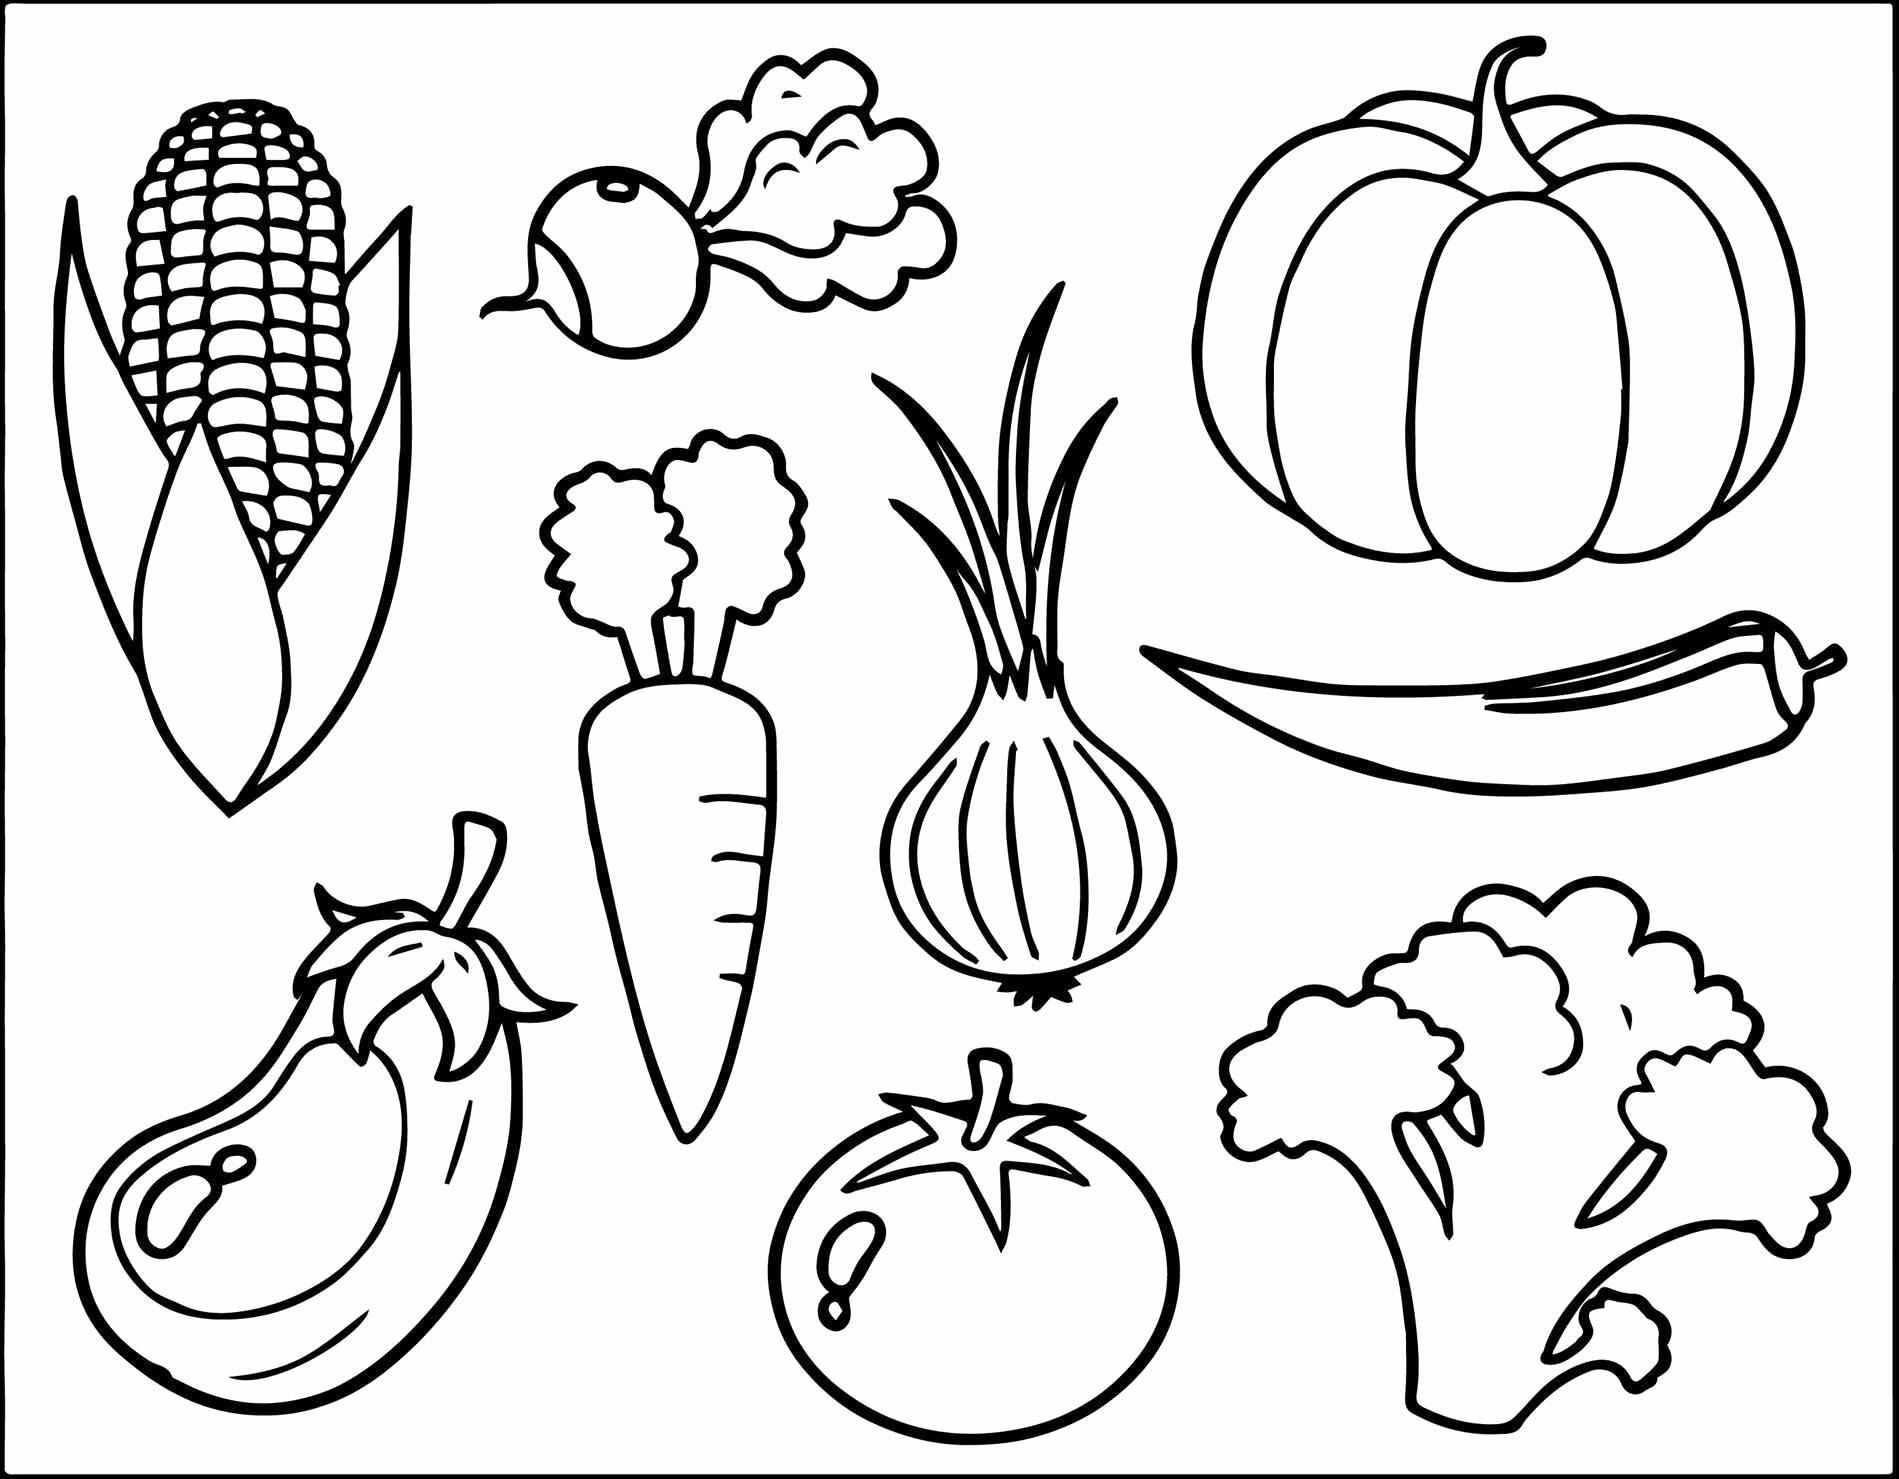 Vegetables Worksheet For Preschool Fruits And Ve Able